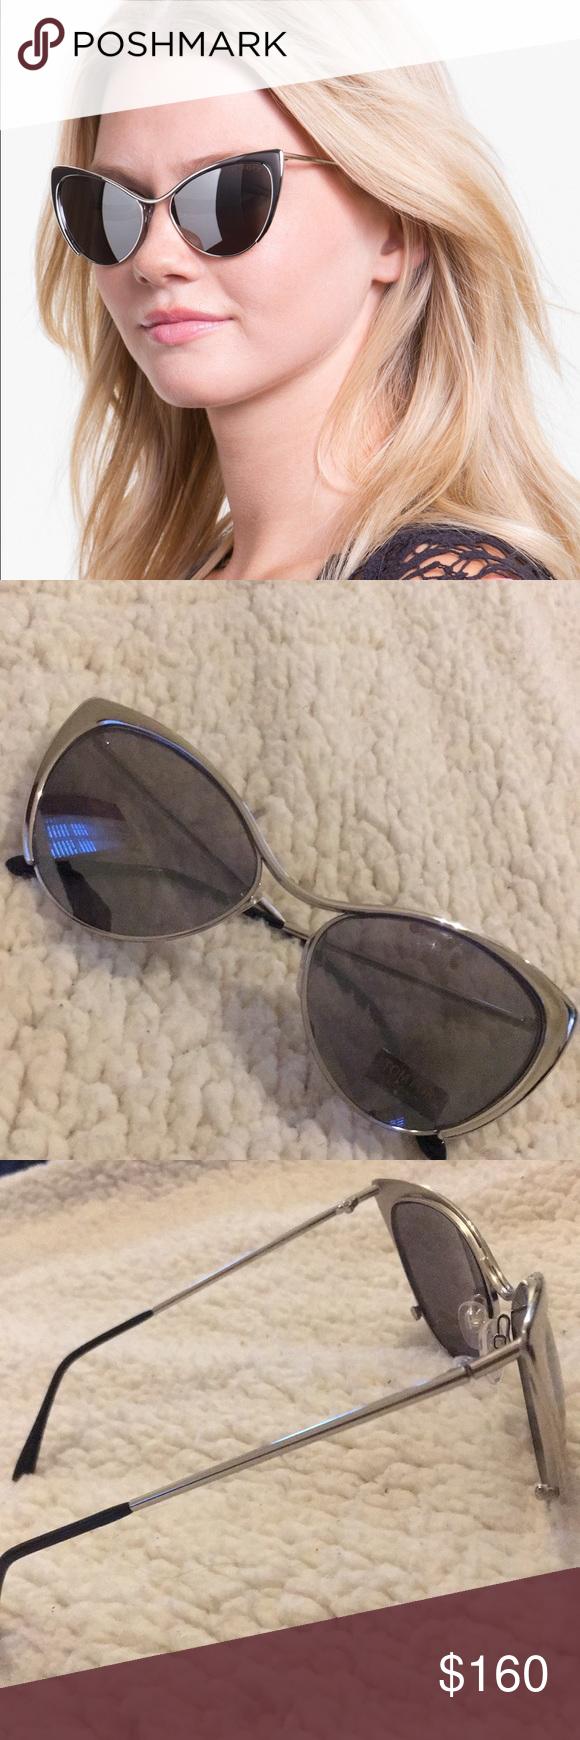 f22daca007c Tom Ford Nastasya Sunglasses Silver Metallic sunglasses